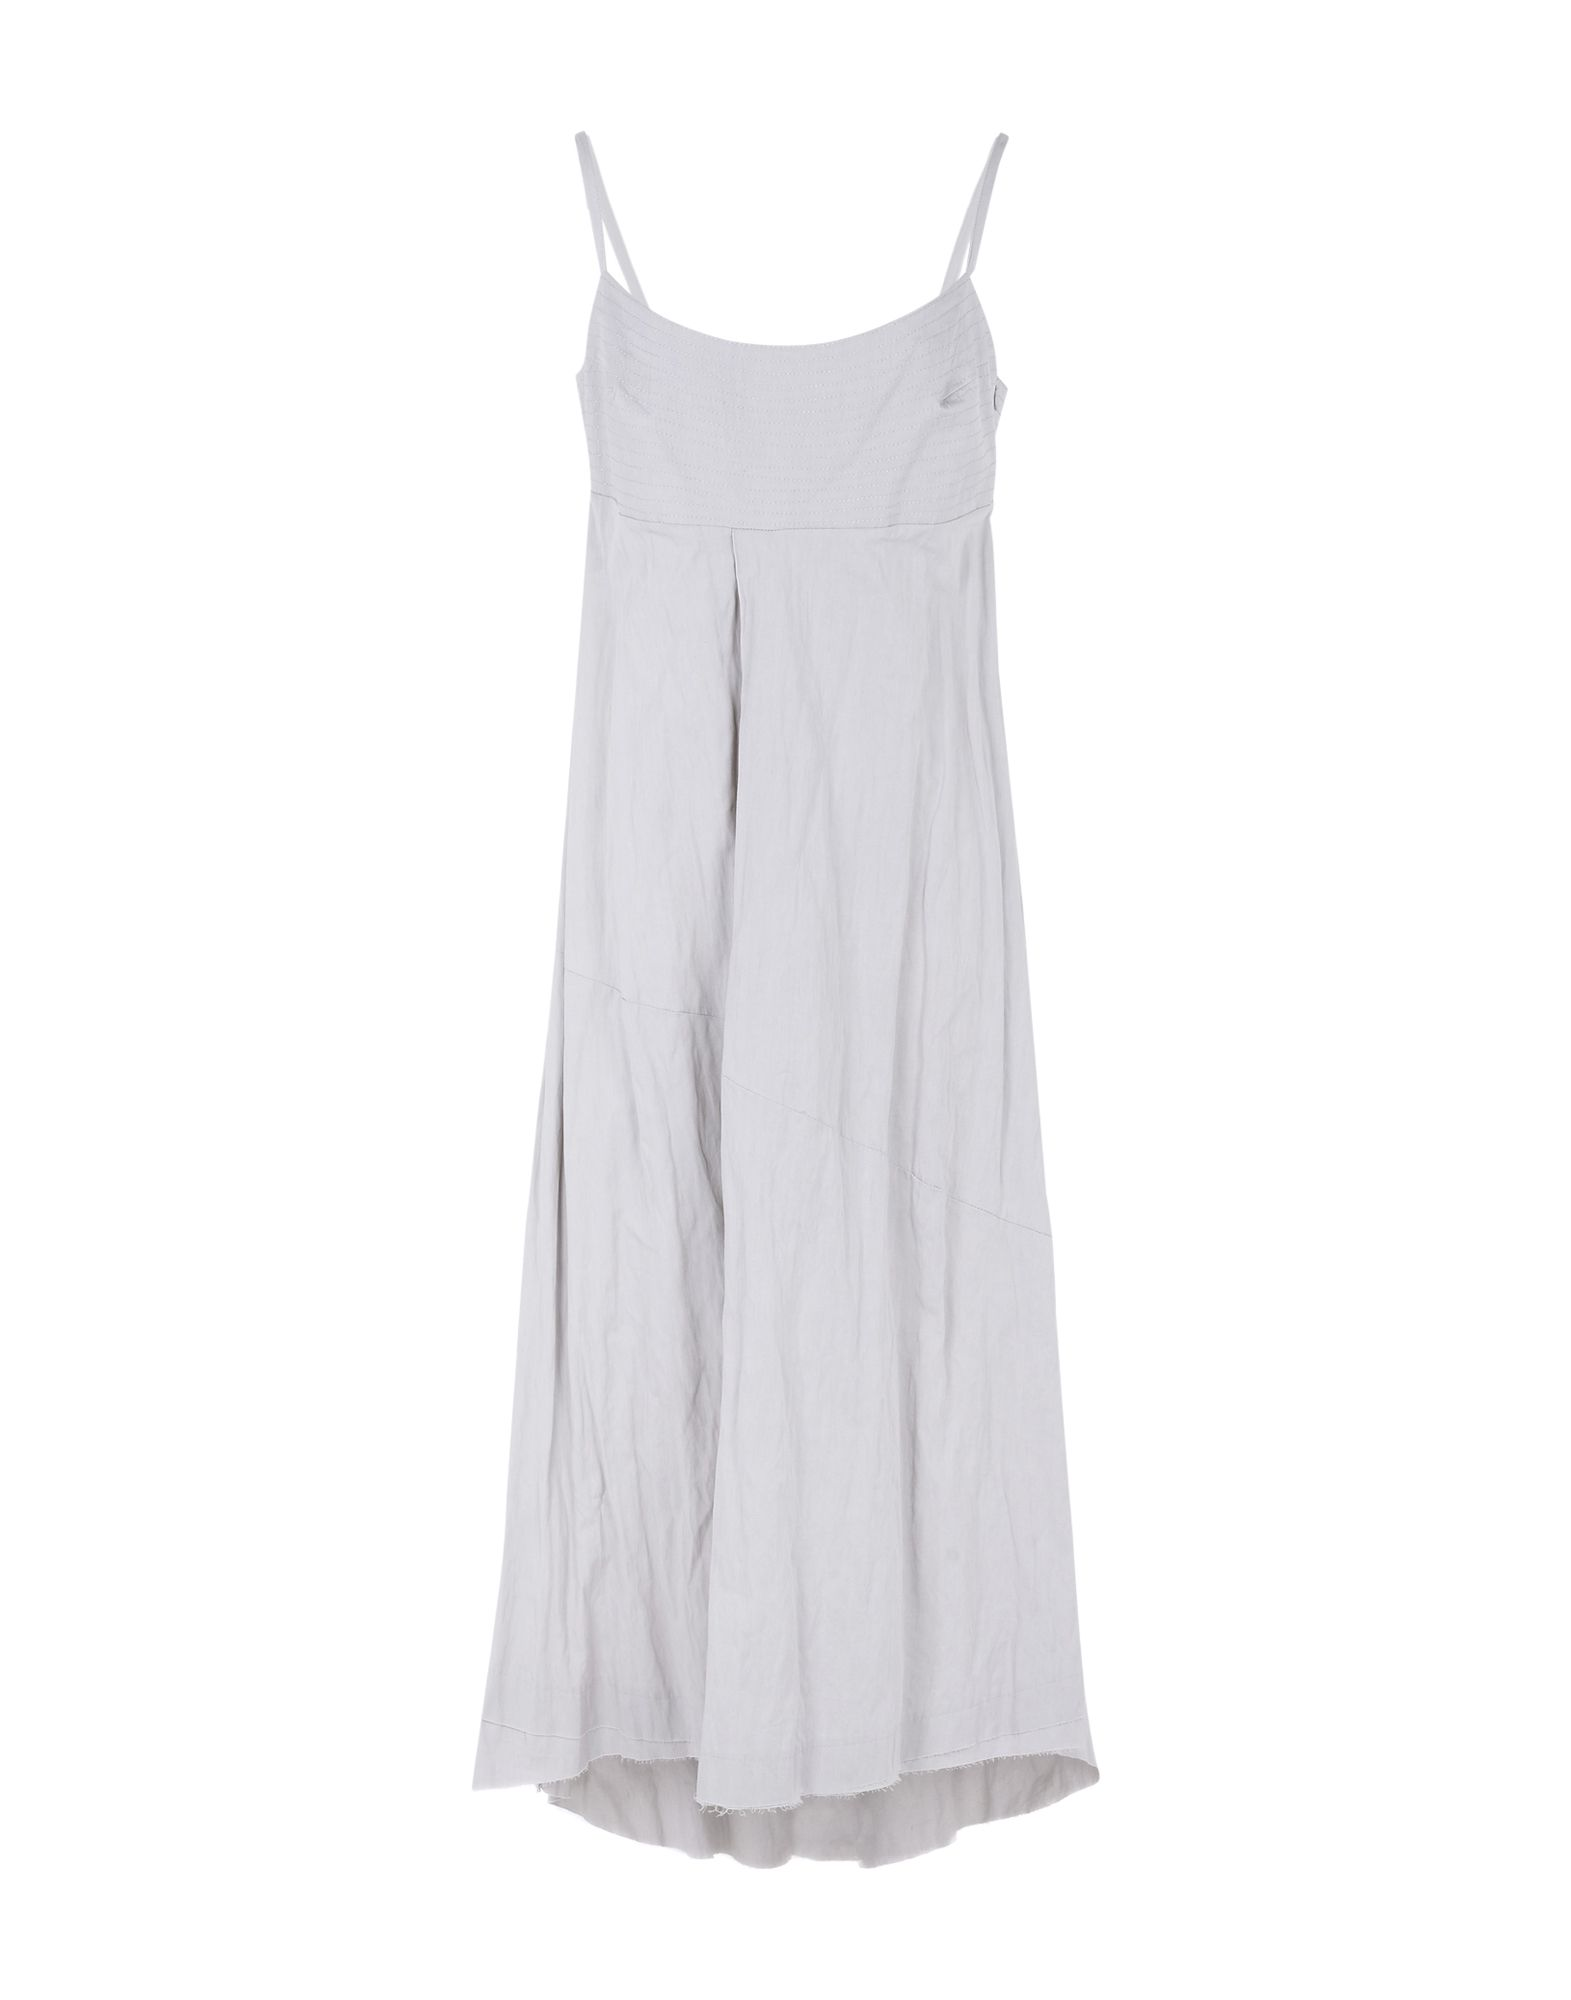 NUOVO BORGO Платье длиной 3/4 philippe pozzo di borgo 1 1 uus hingamine